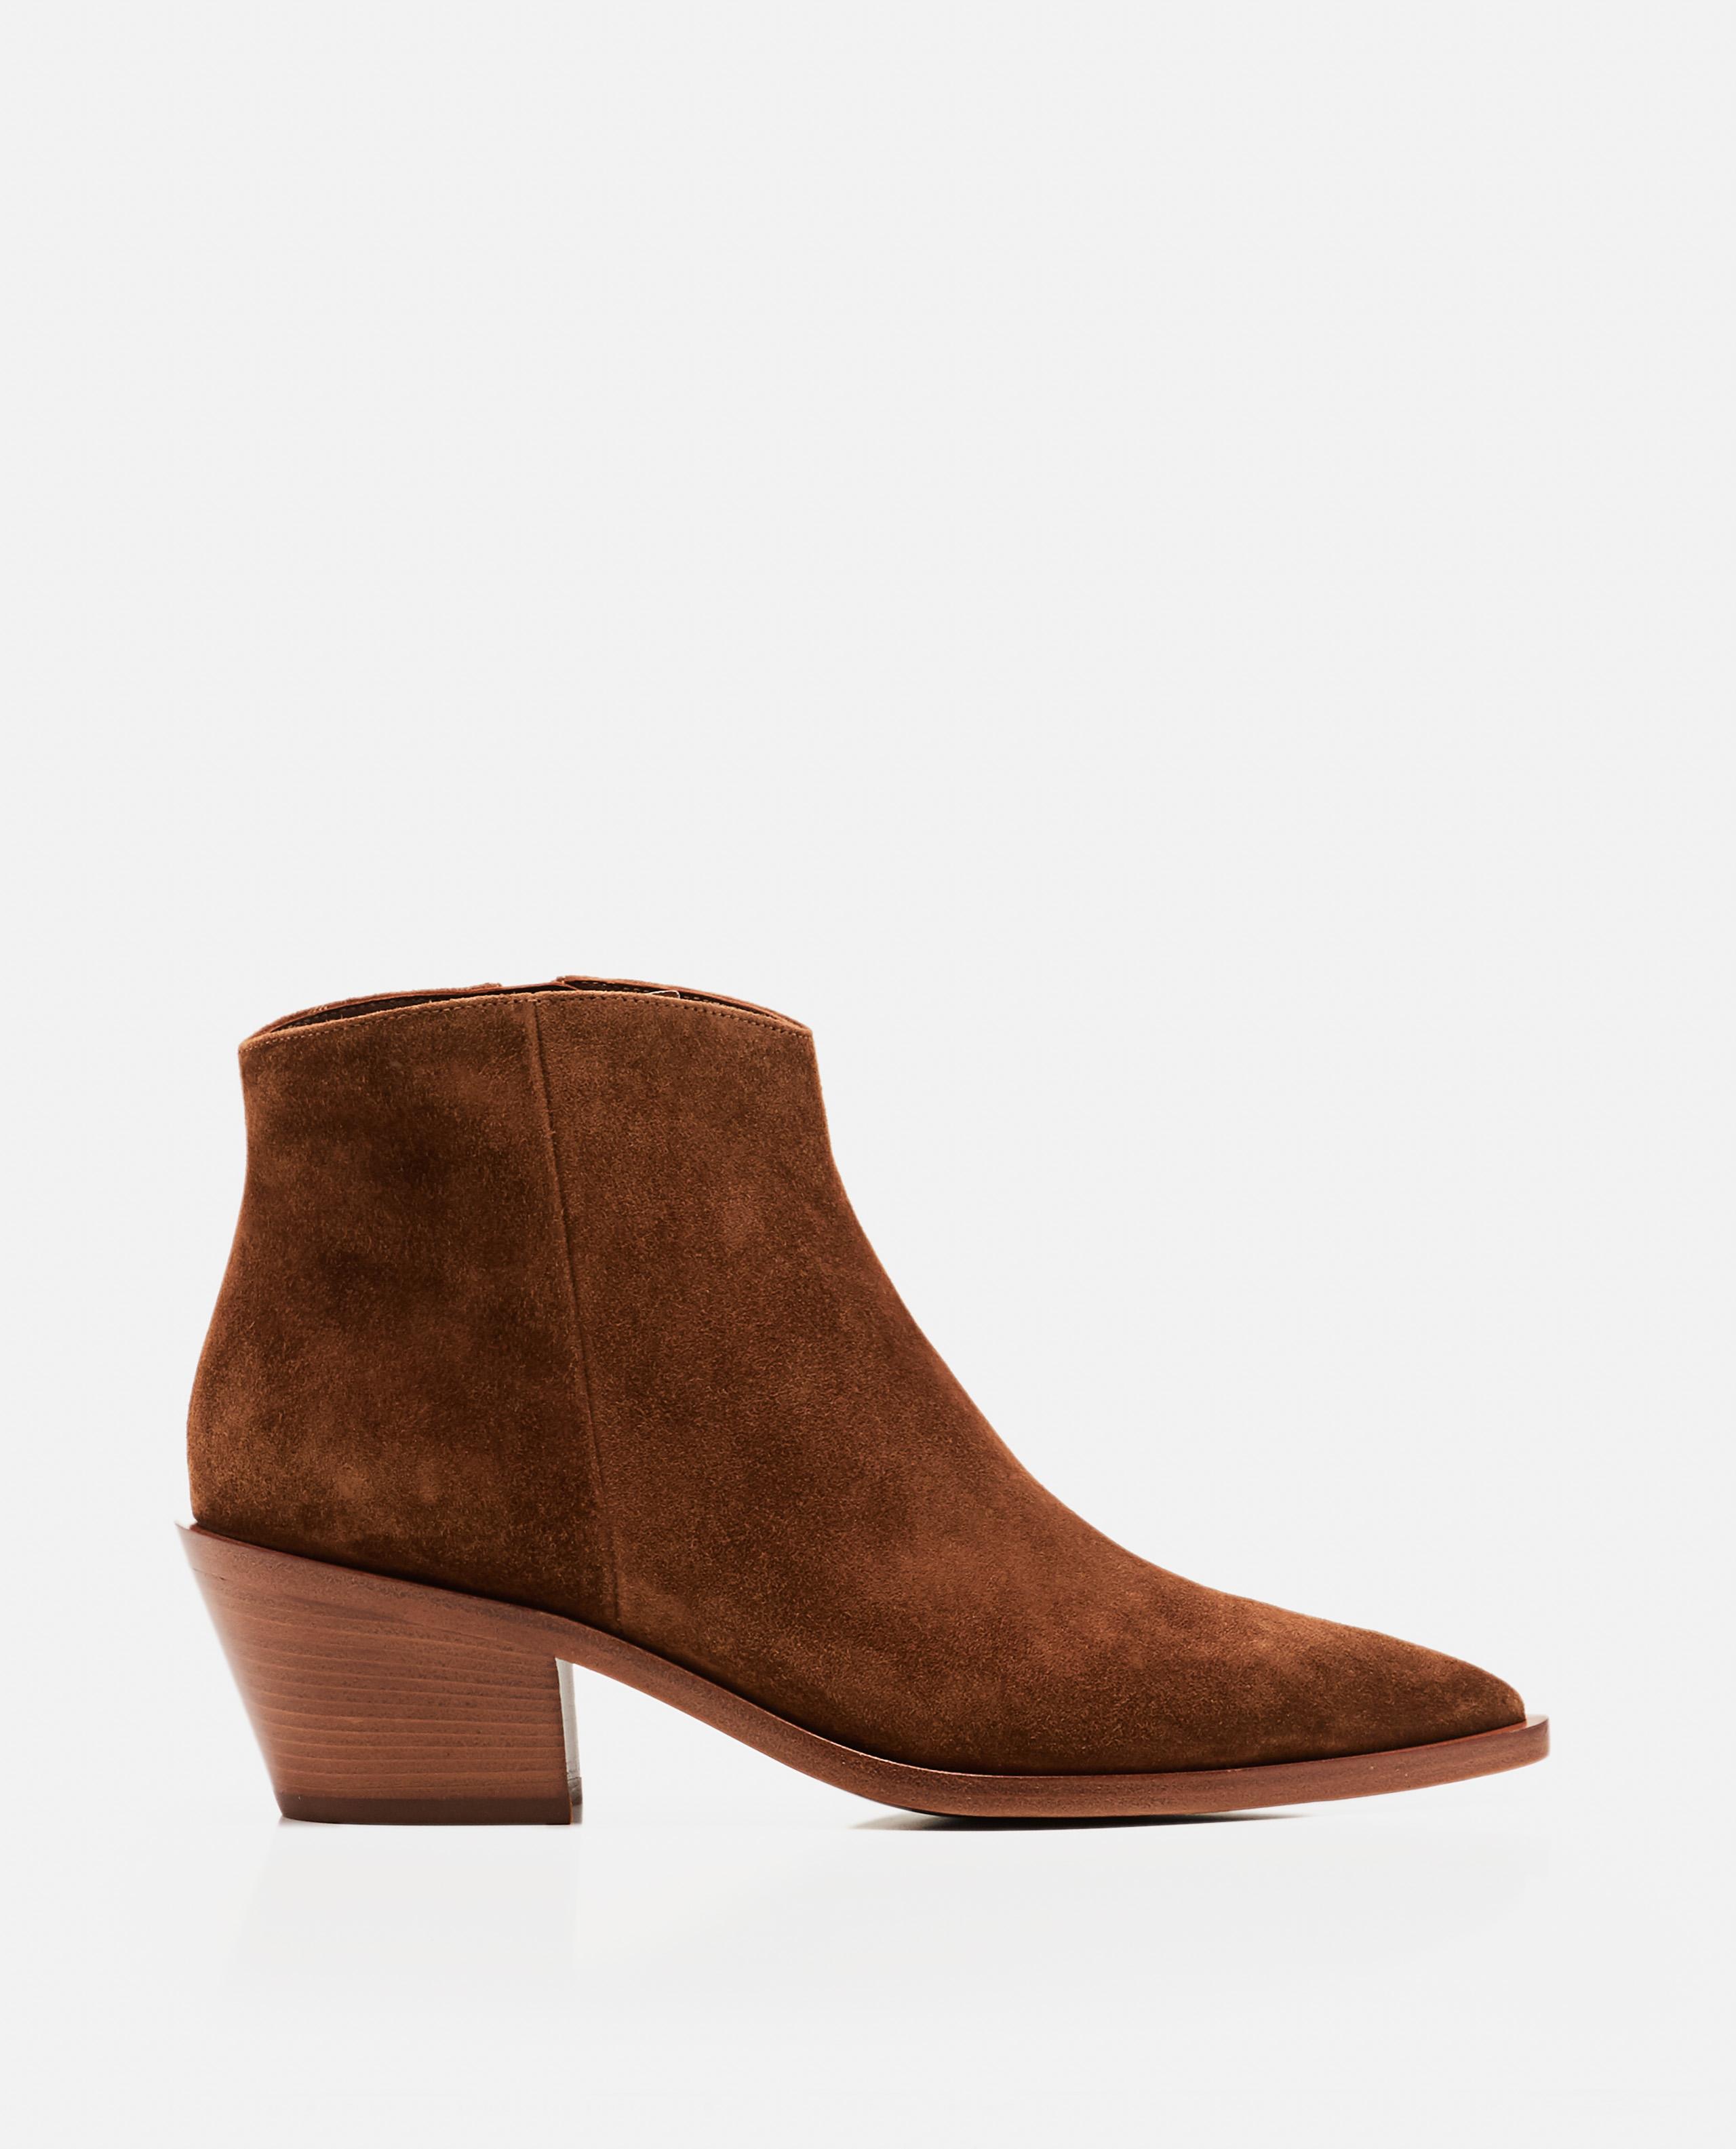 Rica Texas boots